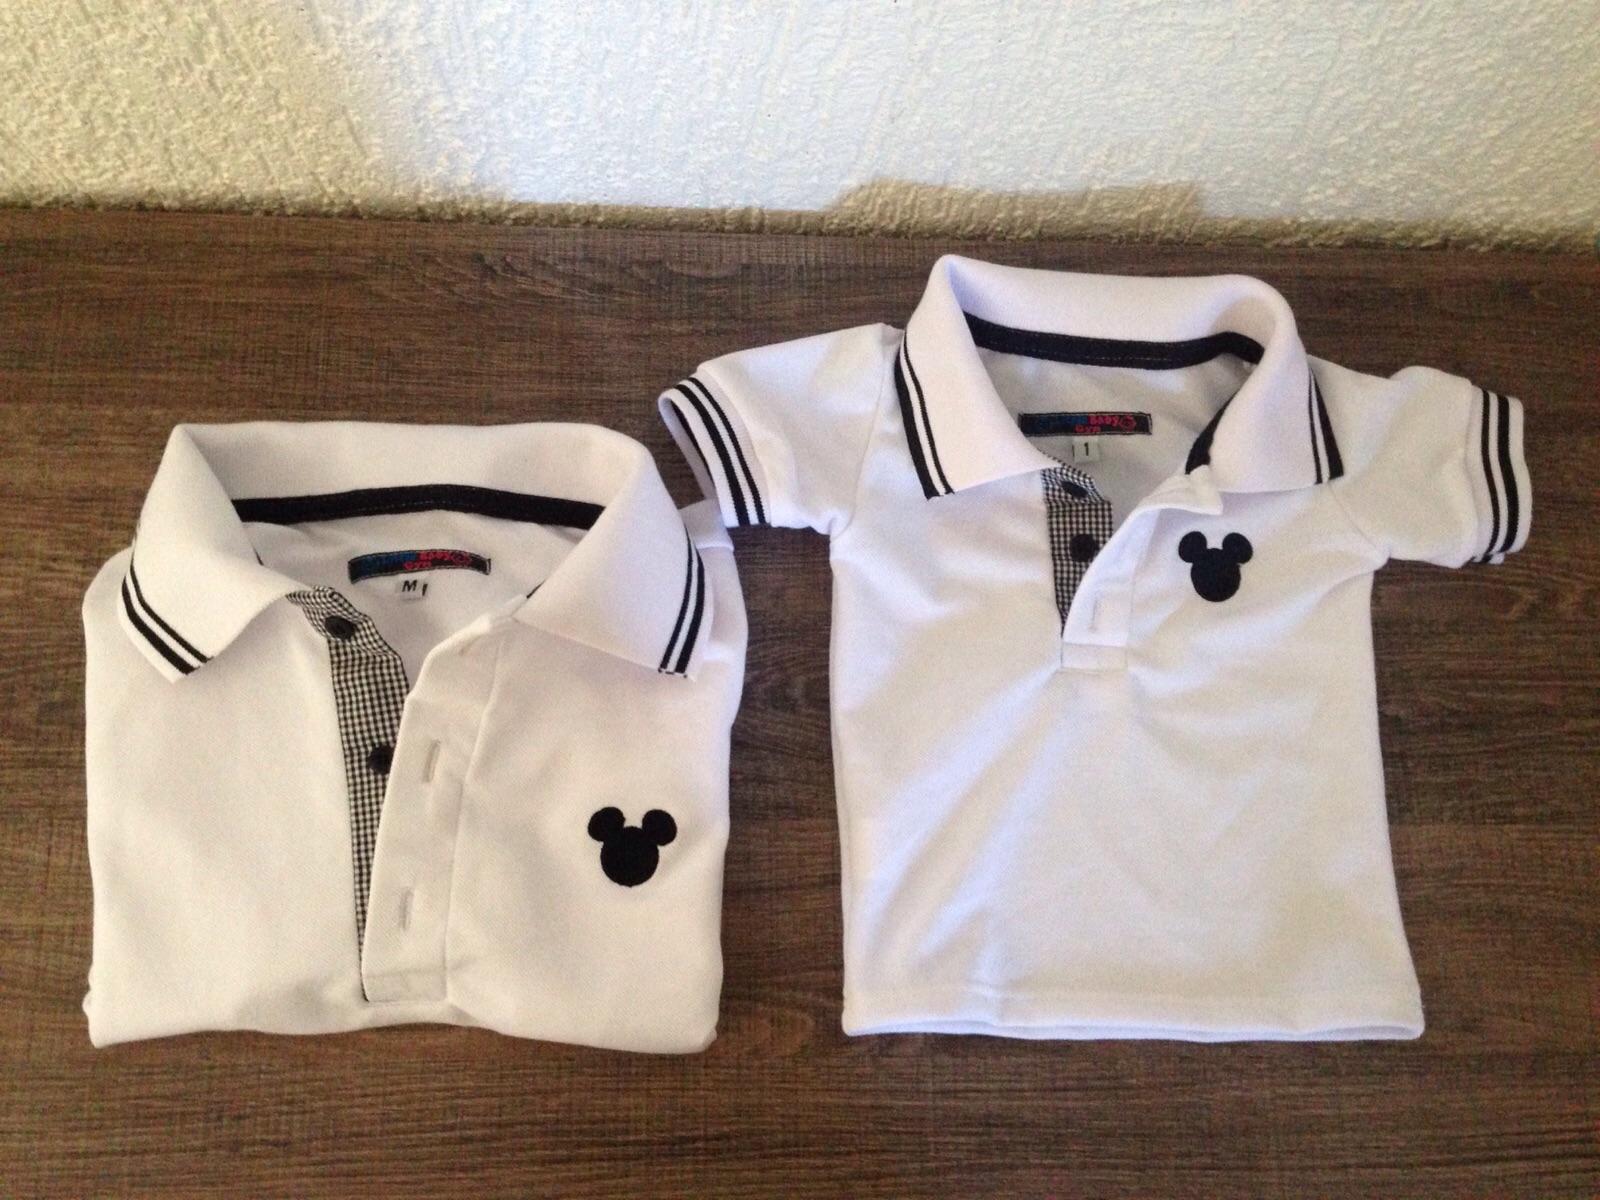 922b27a48e6ba Camisa polo - Coleção de Little Baby Gyn ( littlebabygyn)